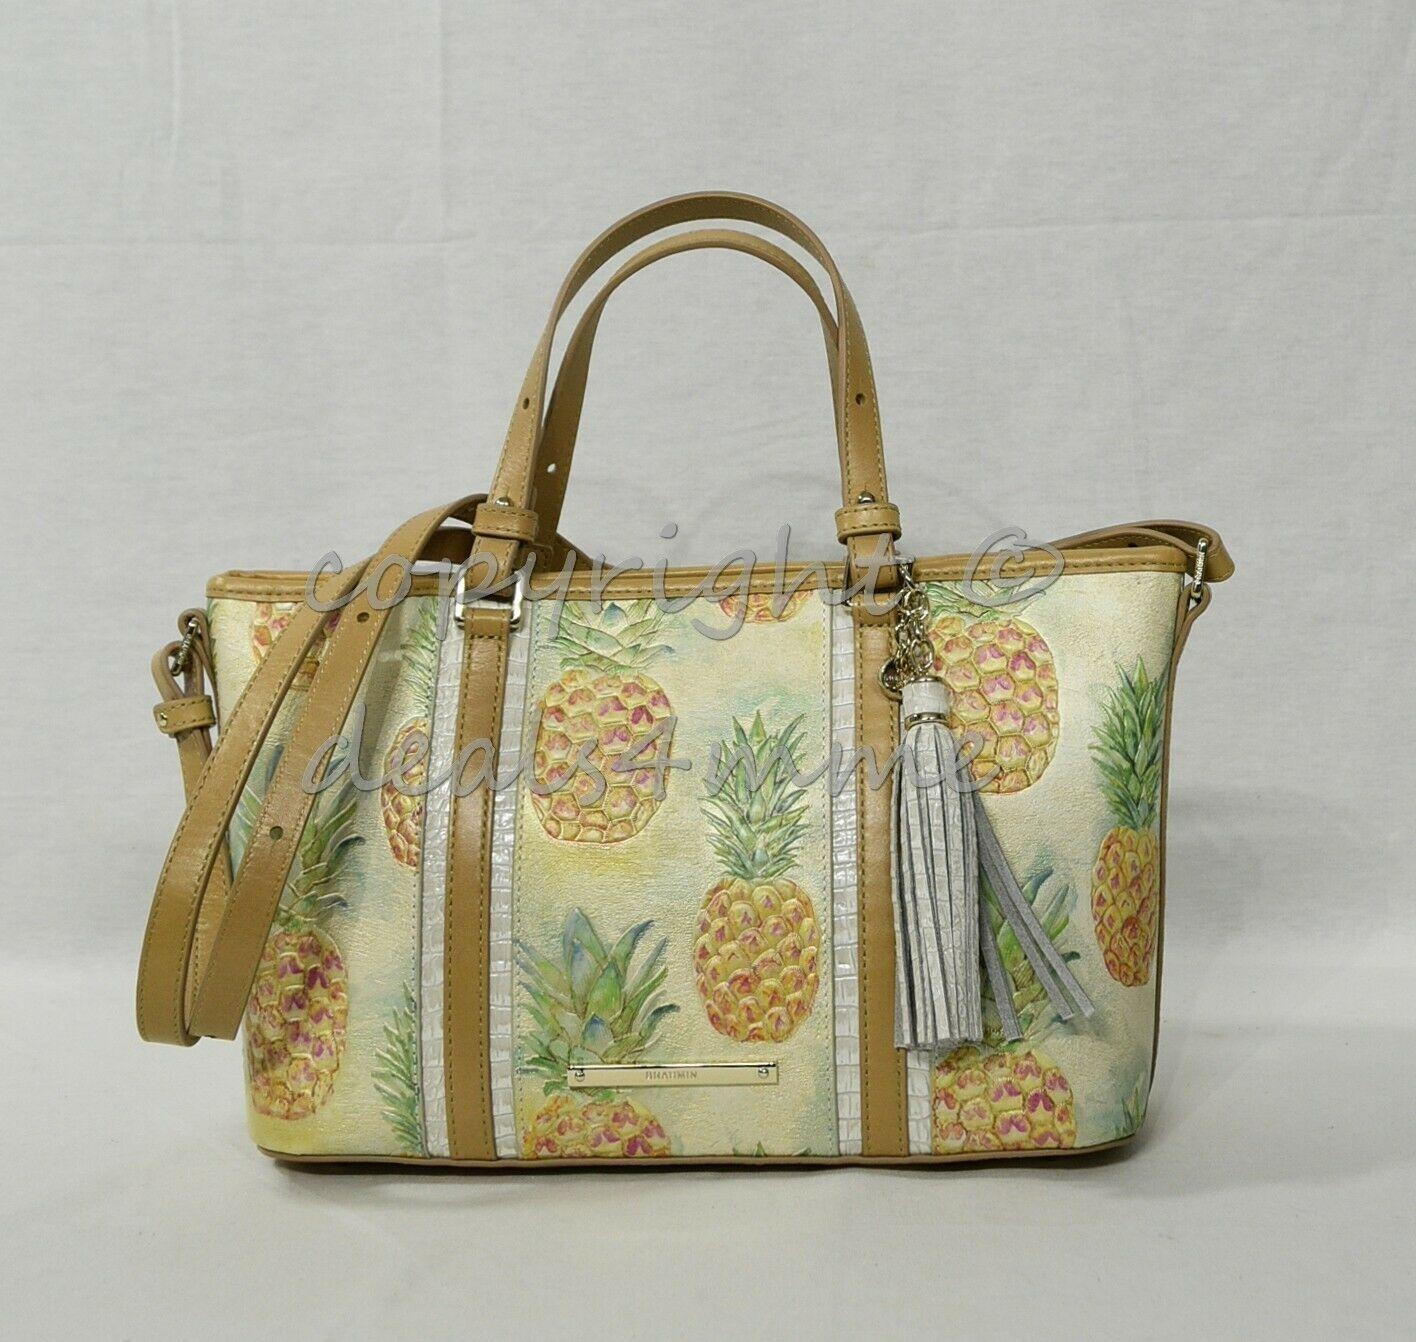 NWT Brahmin Mini Asher Leather Satchel/Shoulder Bag in Multi Pompano